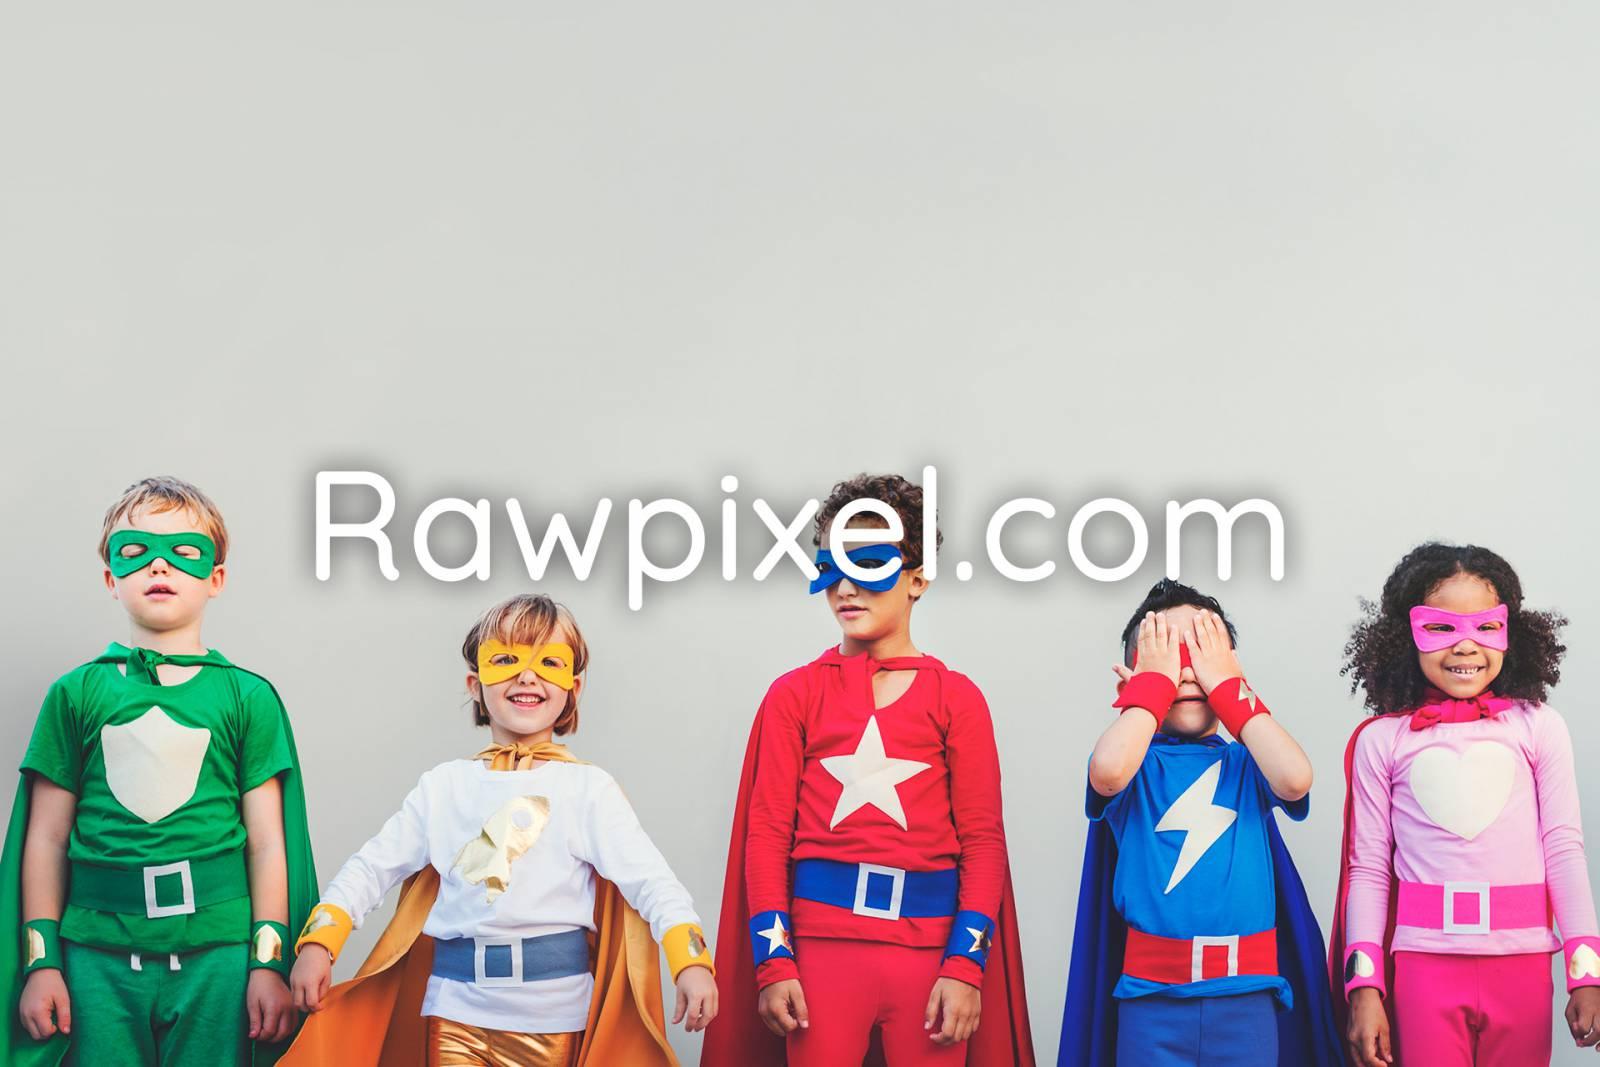 rawpixel gratis stockfoto's